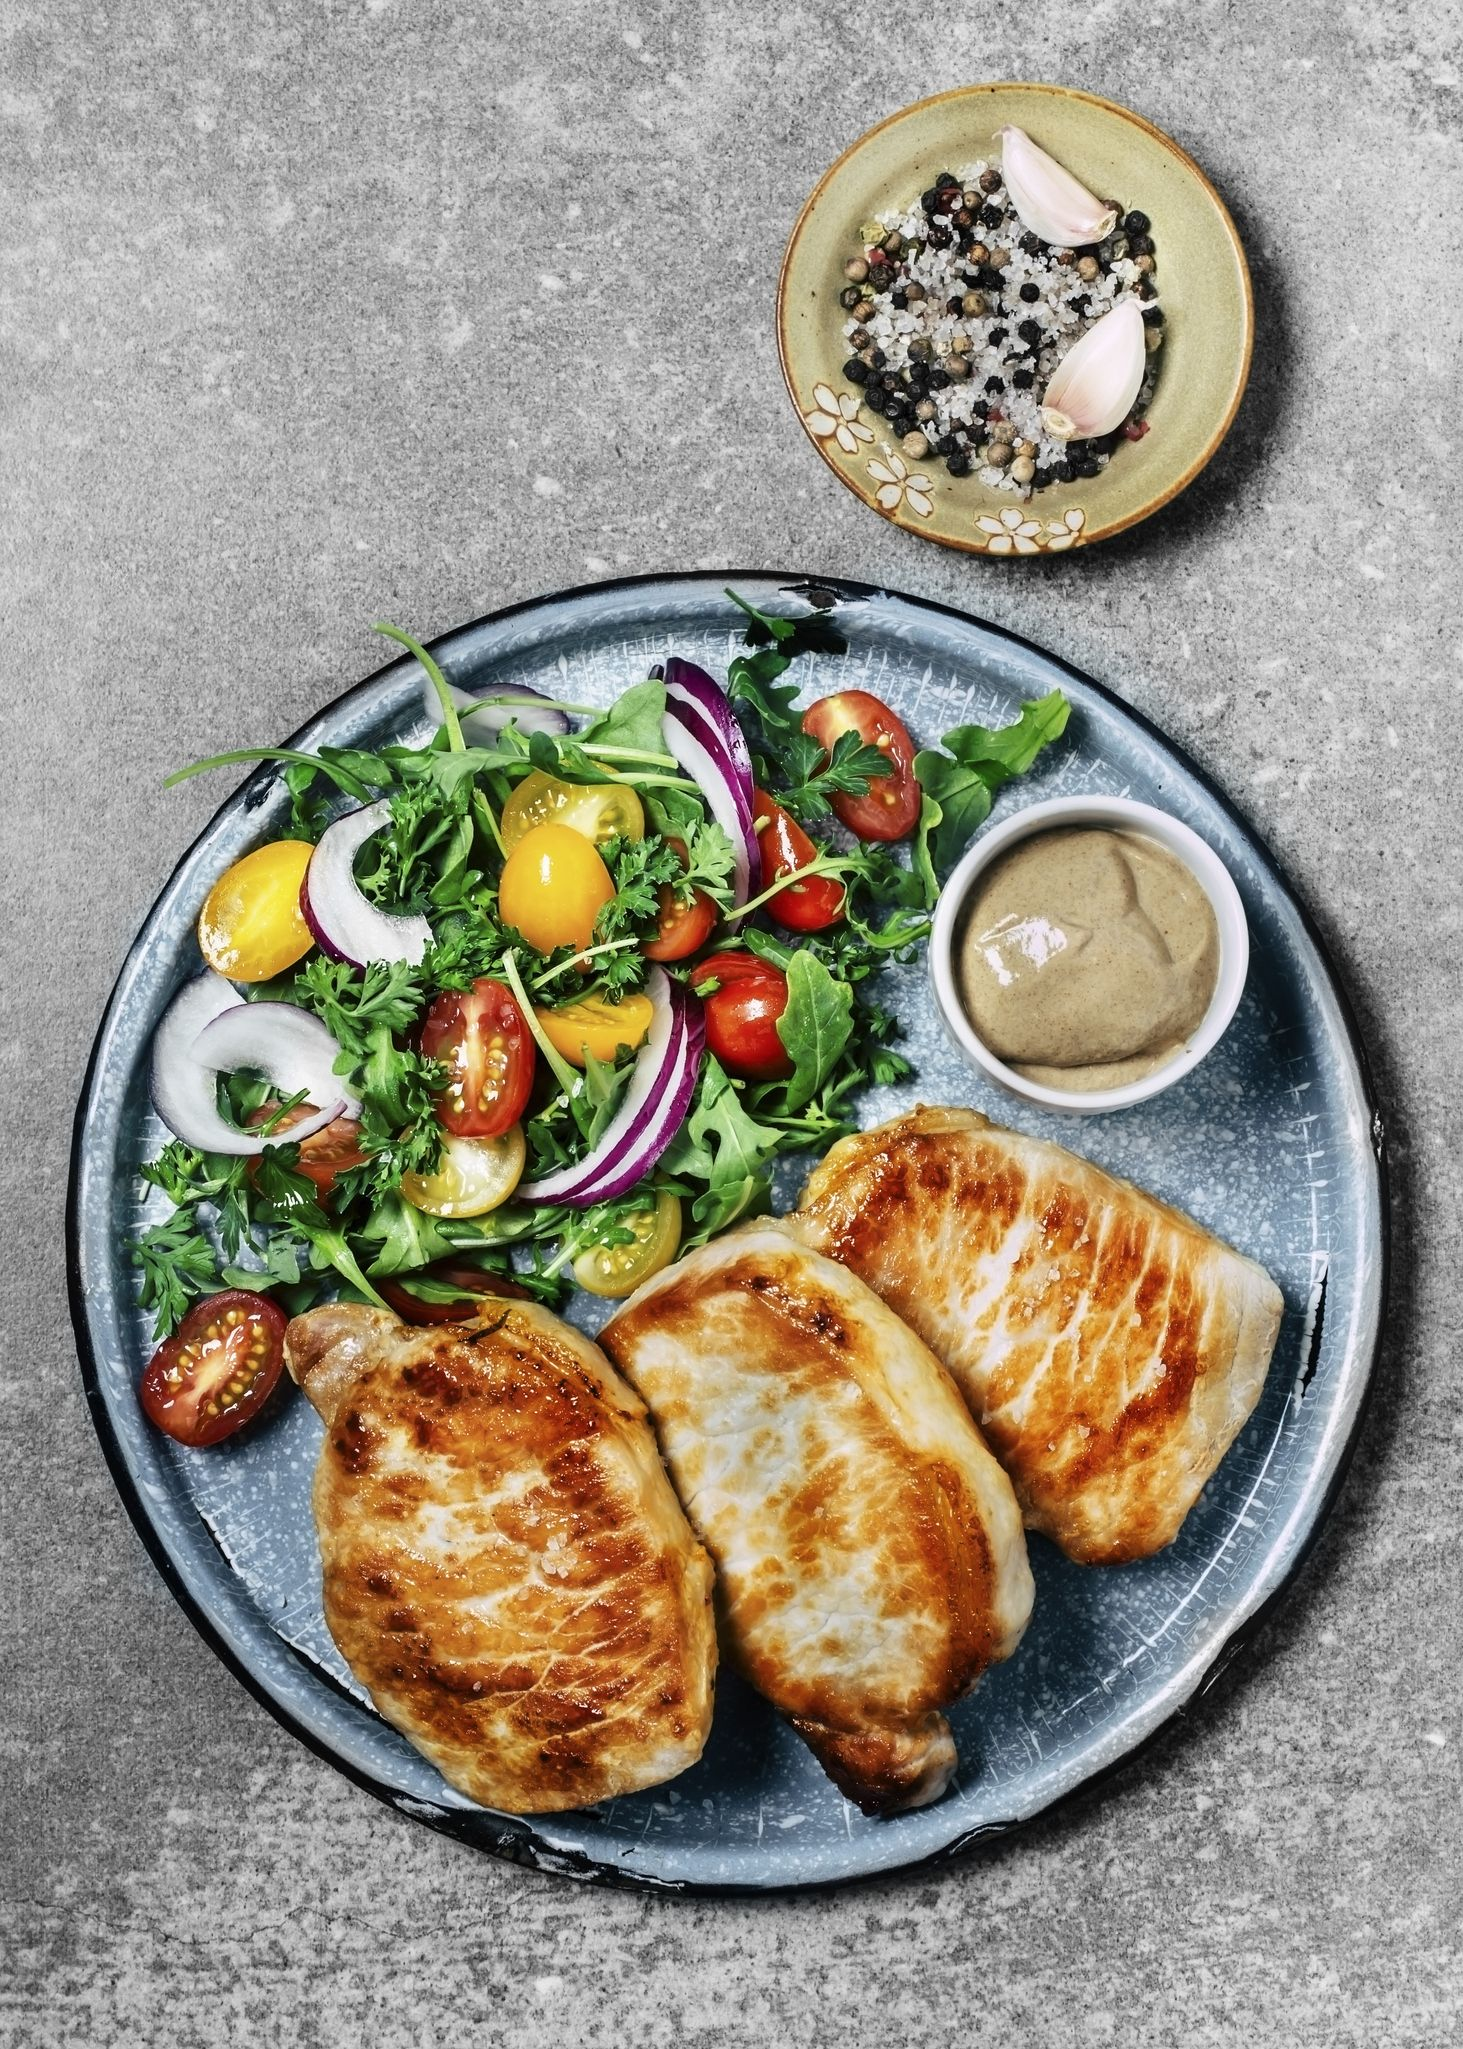 Roasted pork chops with salad